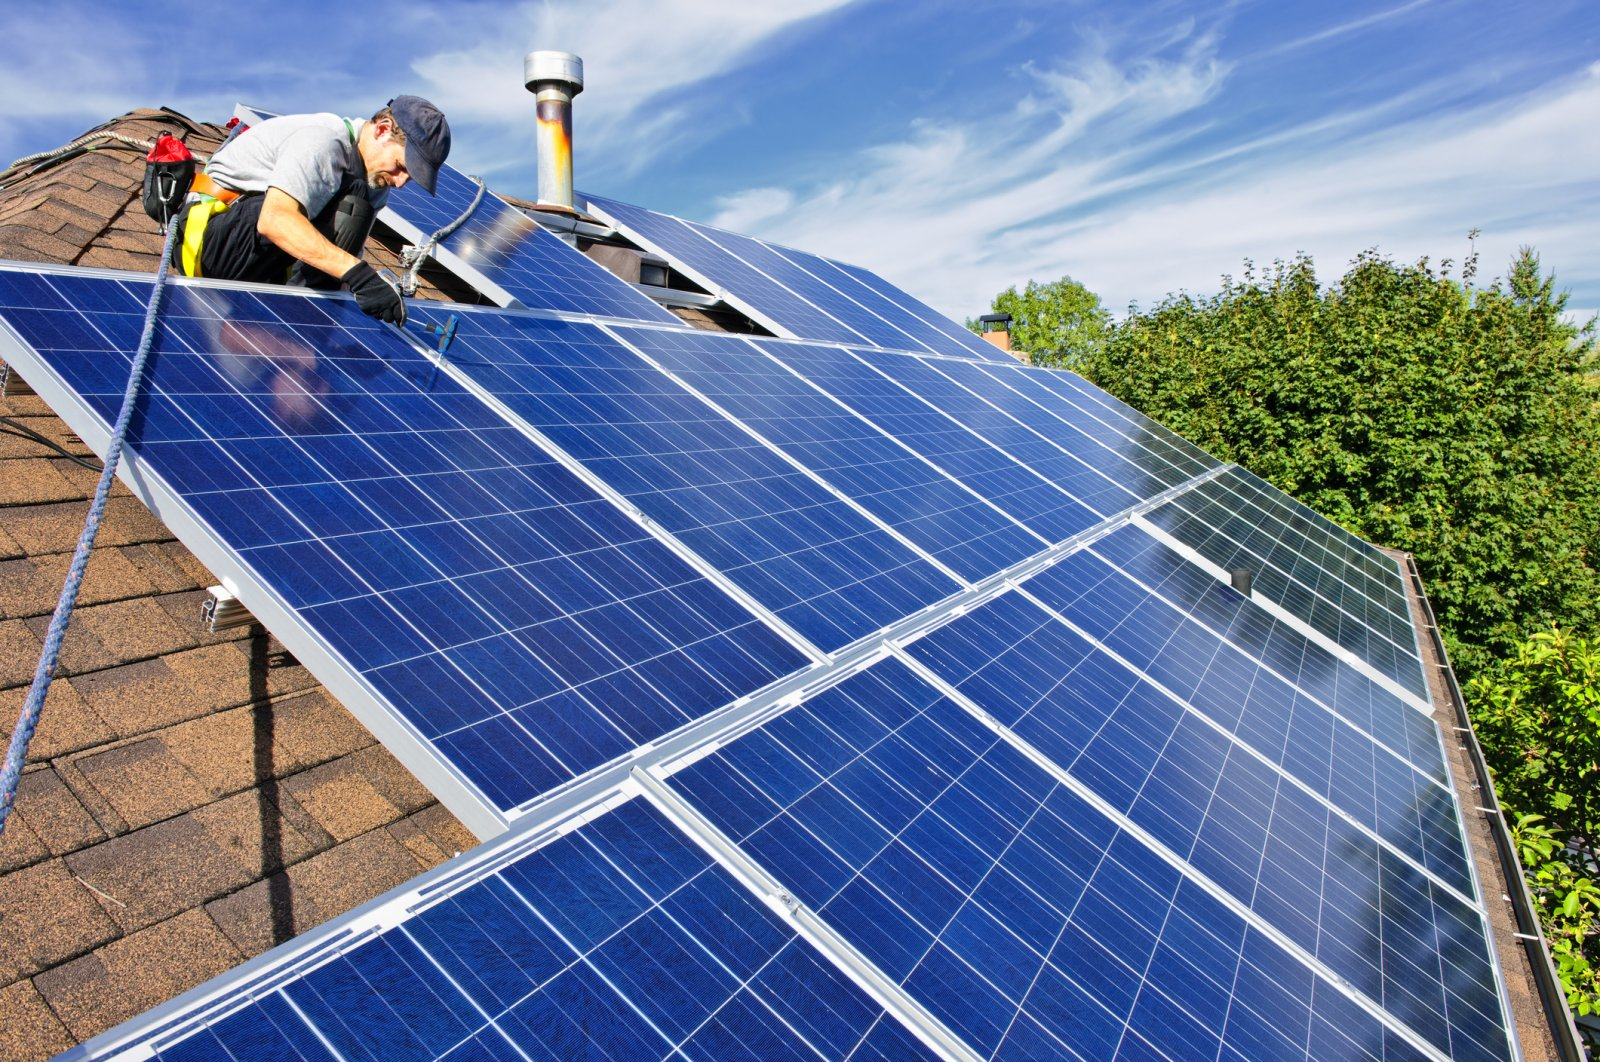 A man installs alternative energy photovoltaic solar panels on the roof. (iStock Photo)